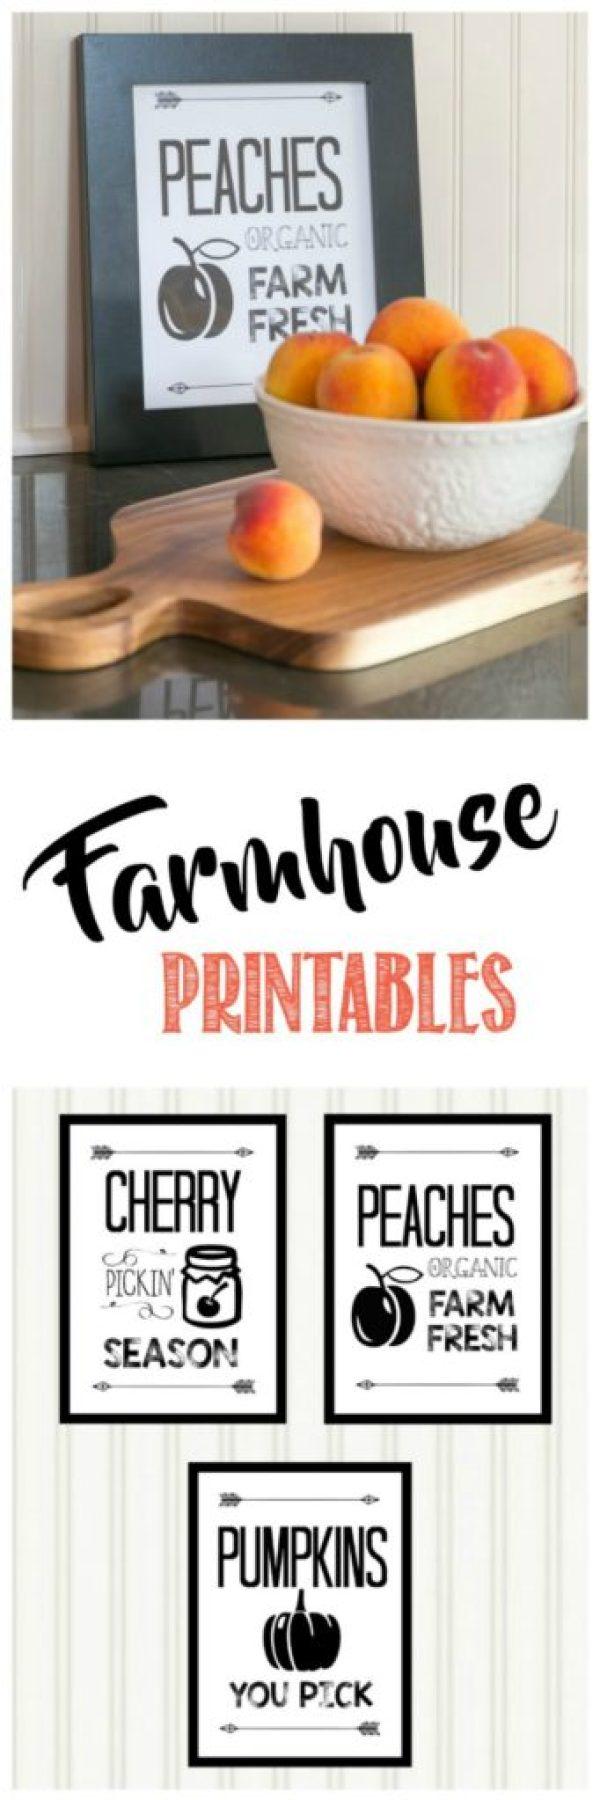 farmhouse-printables-creative-cain-cabin